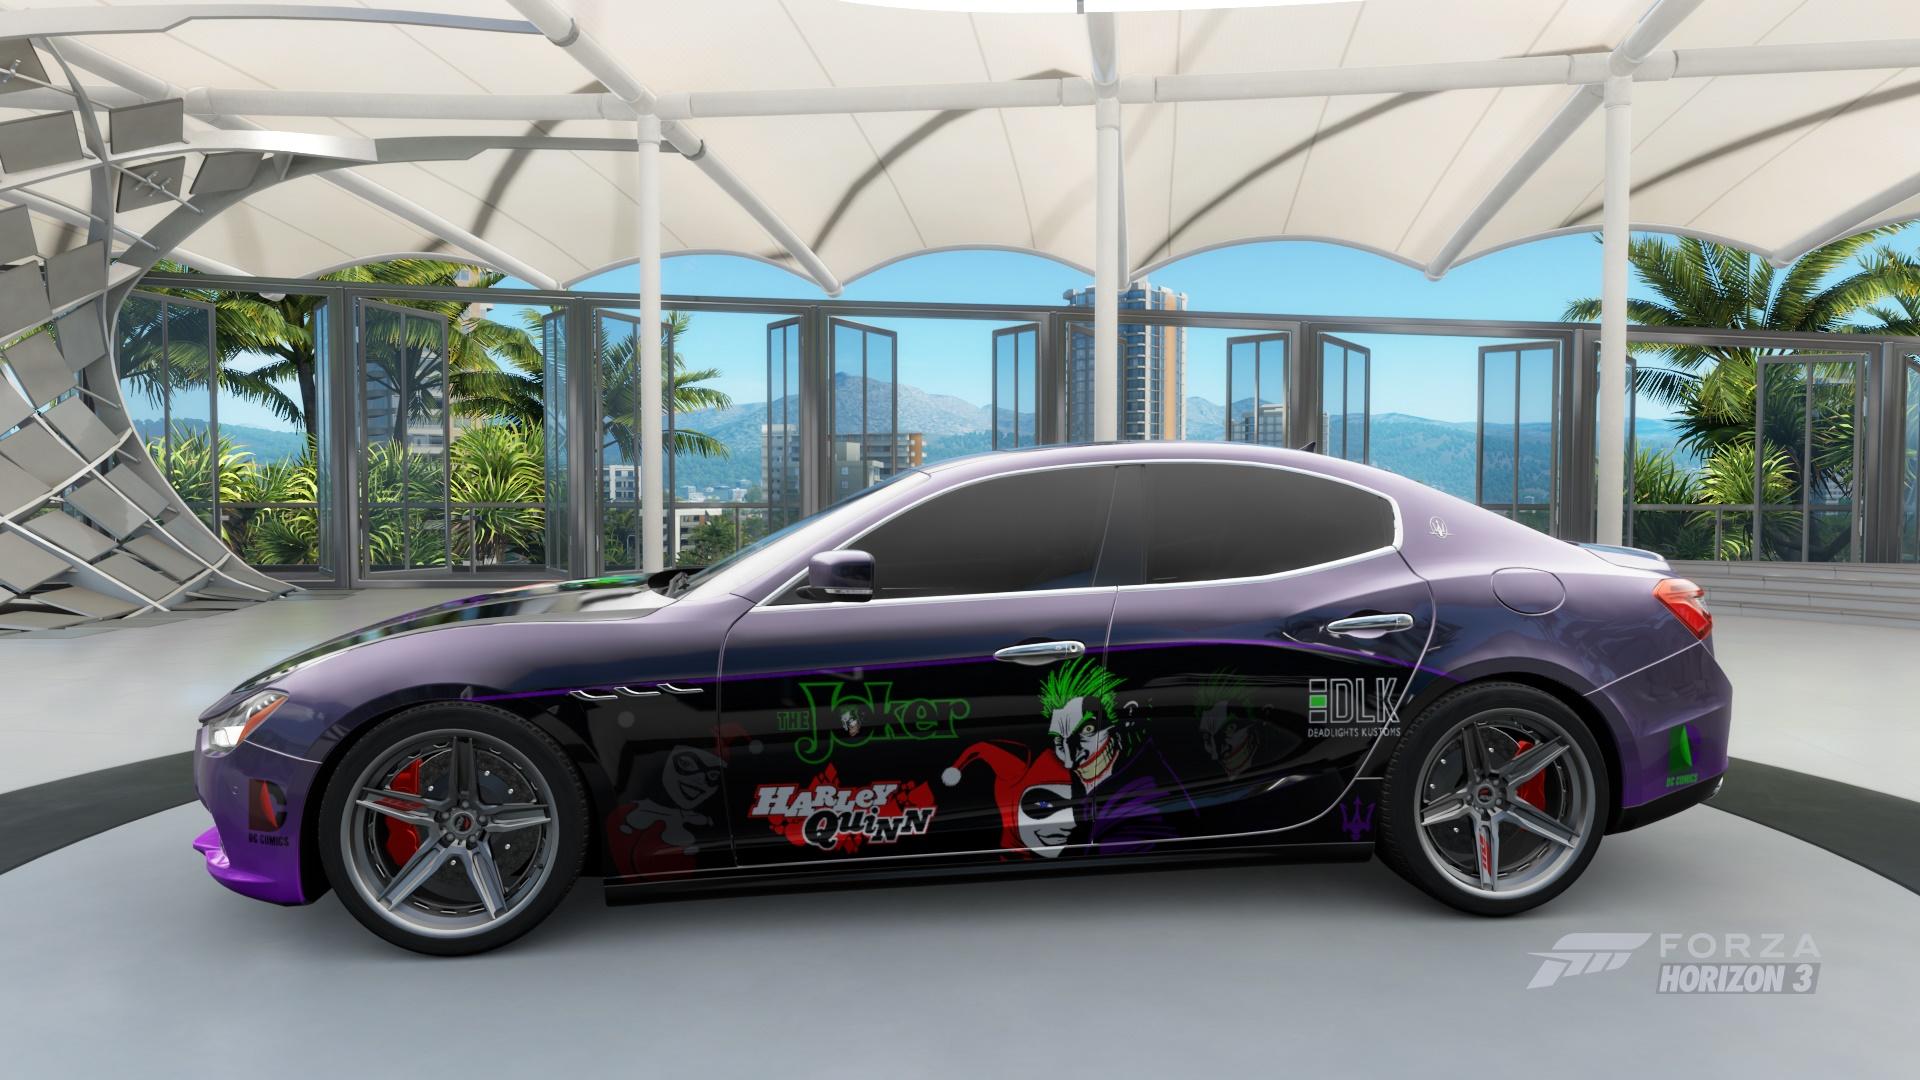 Design car contest - Ryn0s3r1 2014 Maserati Ghibli S Q4 Joker Harley Quinn File Jhq Love Fantasy Livery